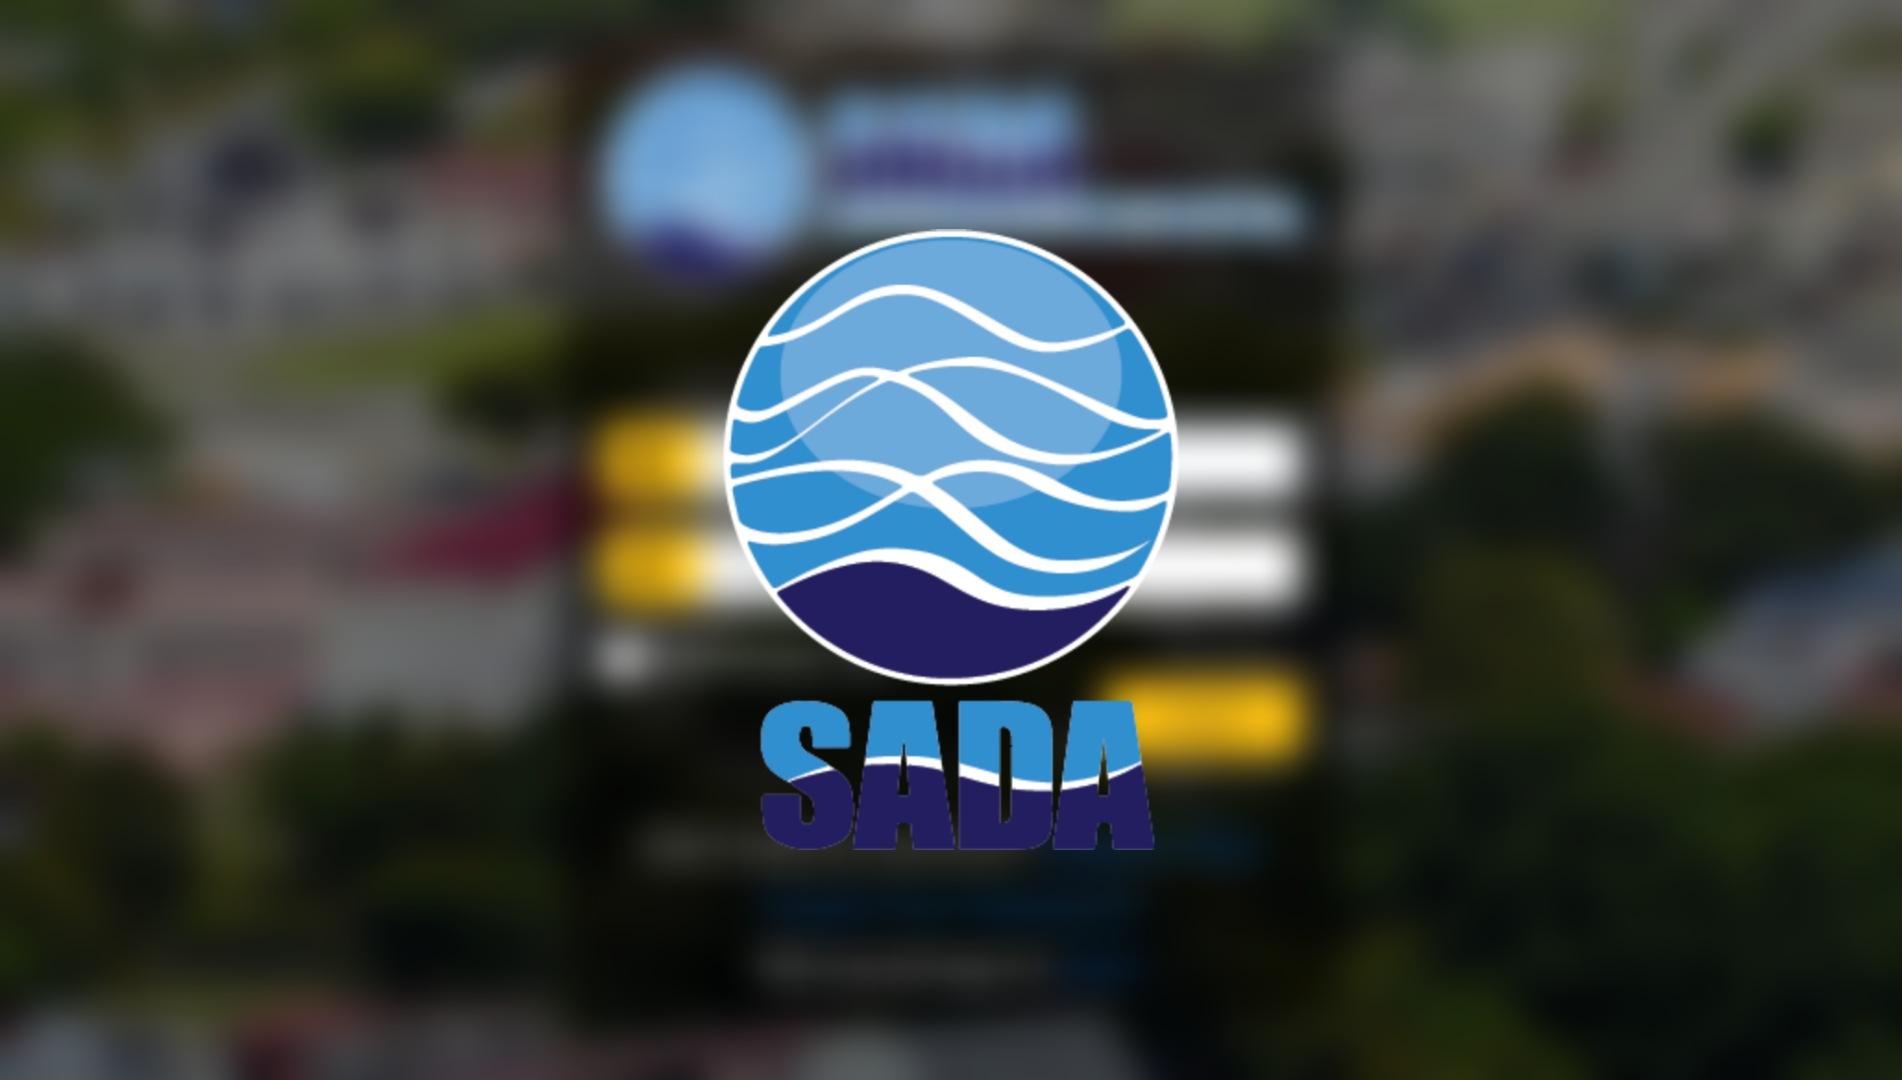 Semakan Bil Air SADA Kedah 2021 Online (Cara Daftar)